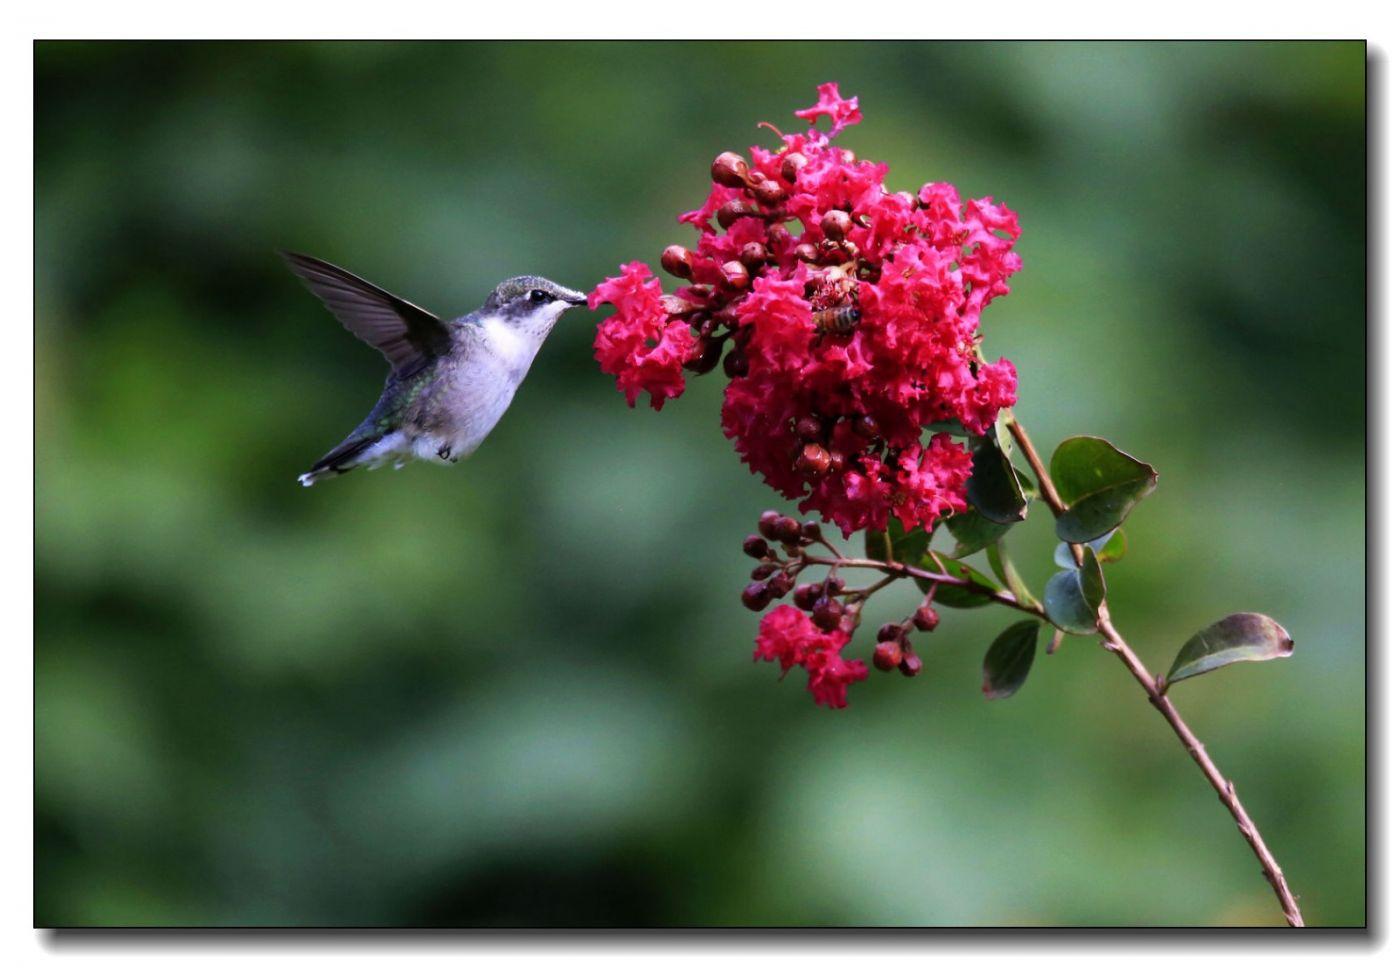 蜂鸟组图(六)_图1-9